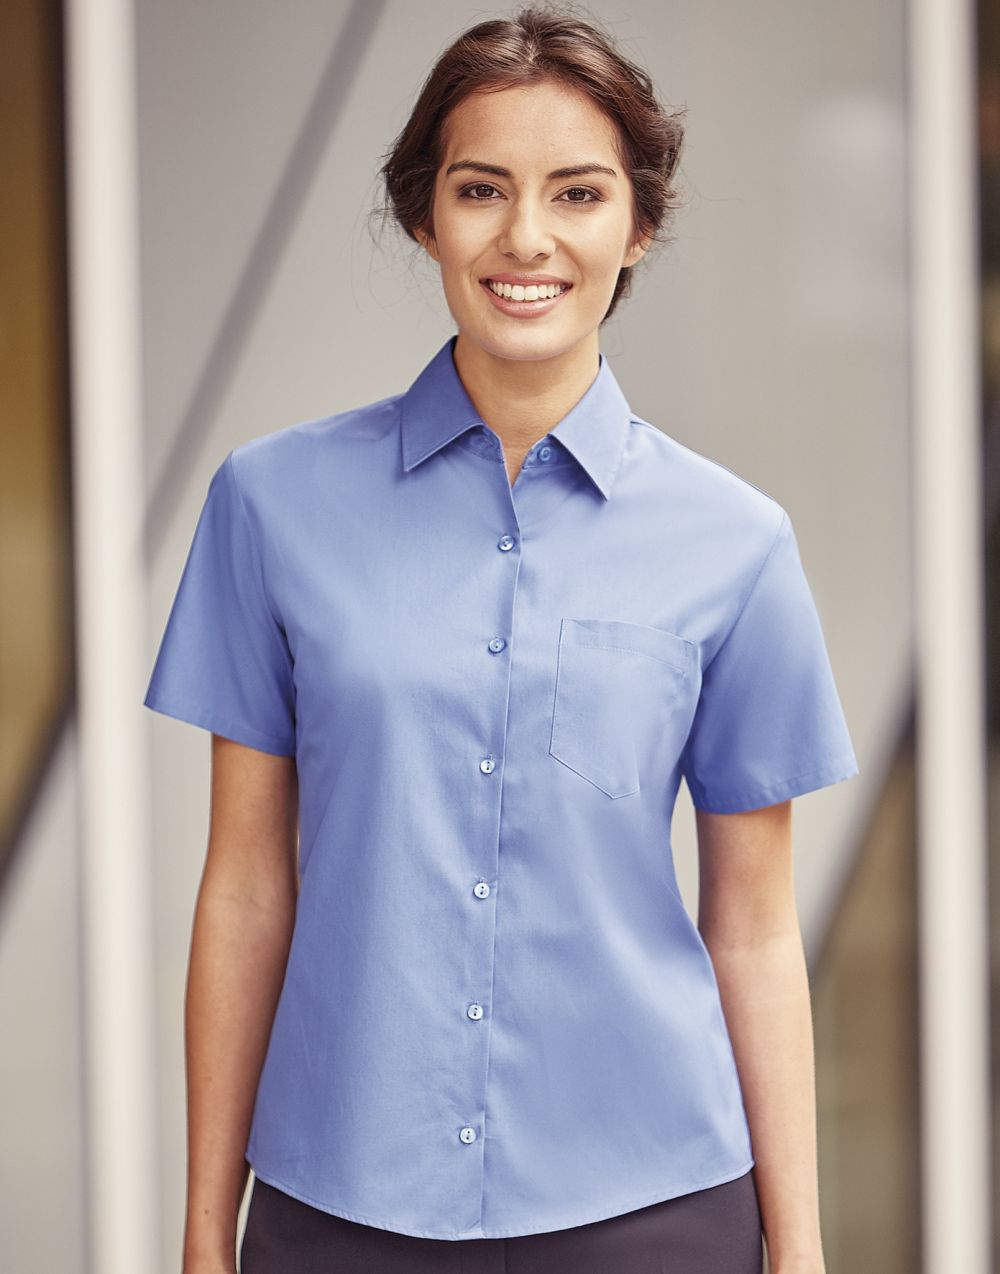 Camisas manga corta russell popelin mujer con publicidad vista 1